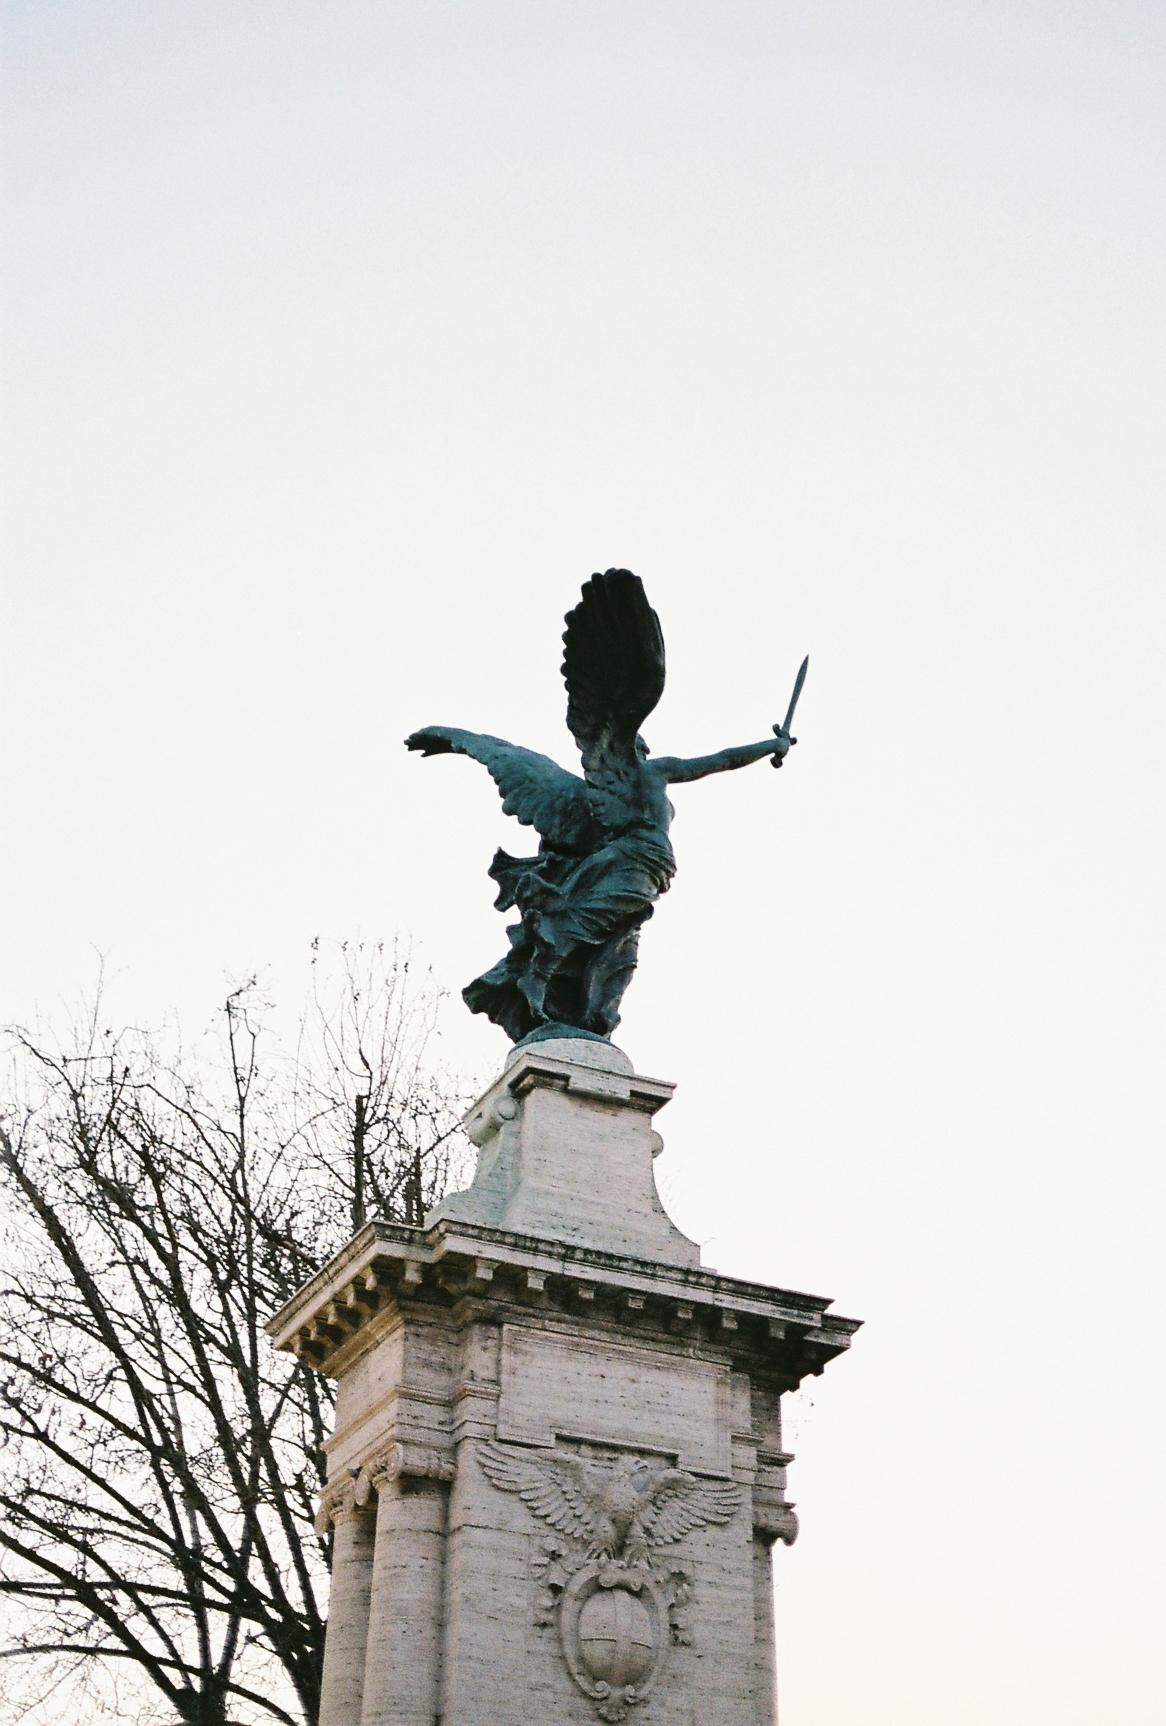 Statue 2018 Edit (1 of 1).jpg